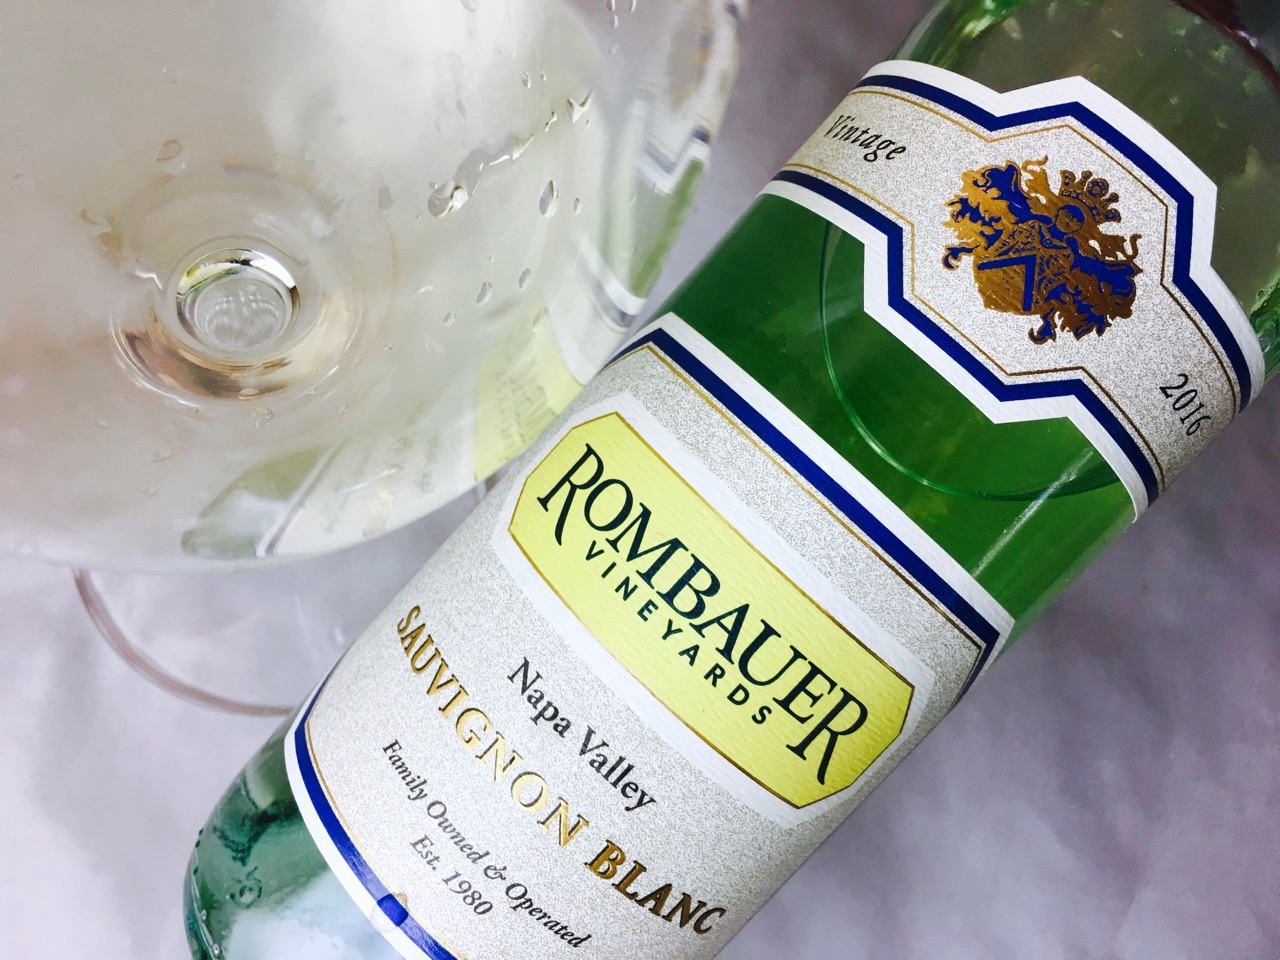 2016 Rombauer Sauvignon Blanc Napa Valley